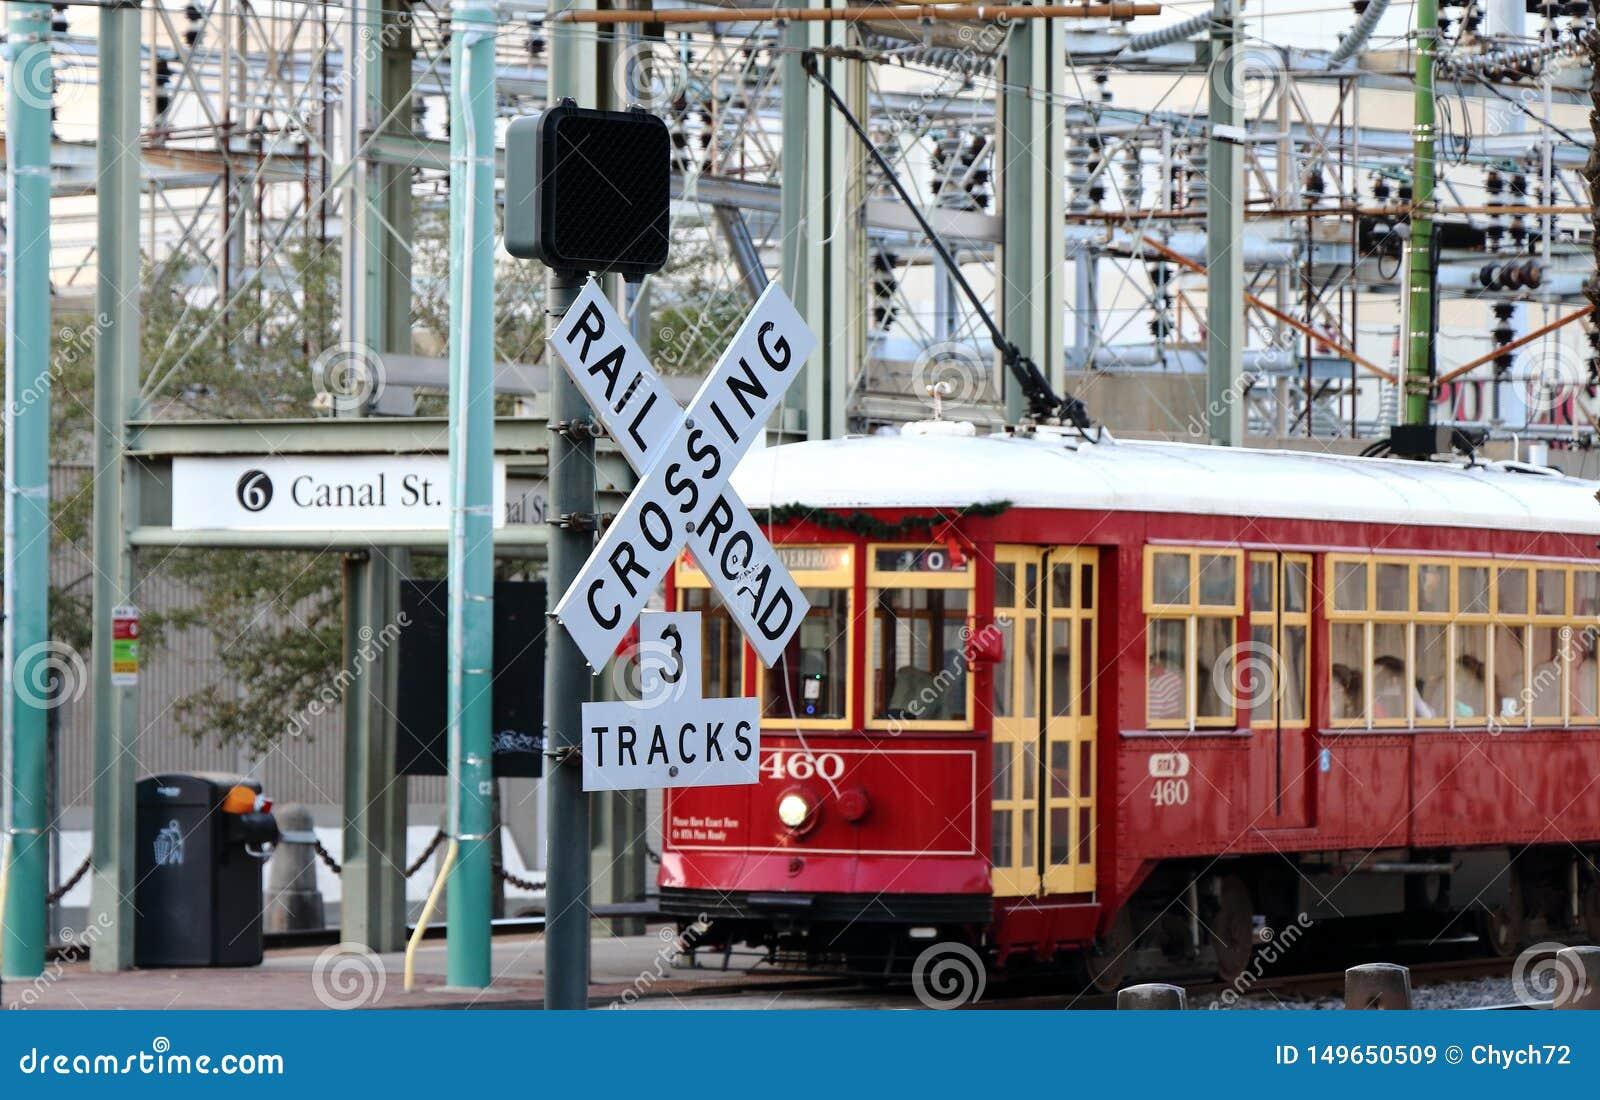 Stoped στο πέρασμα ο σιδηρόδρομος ως τραμ πέρασε, Νέα Ορλεάνη, Λουιζιάνα